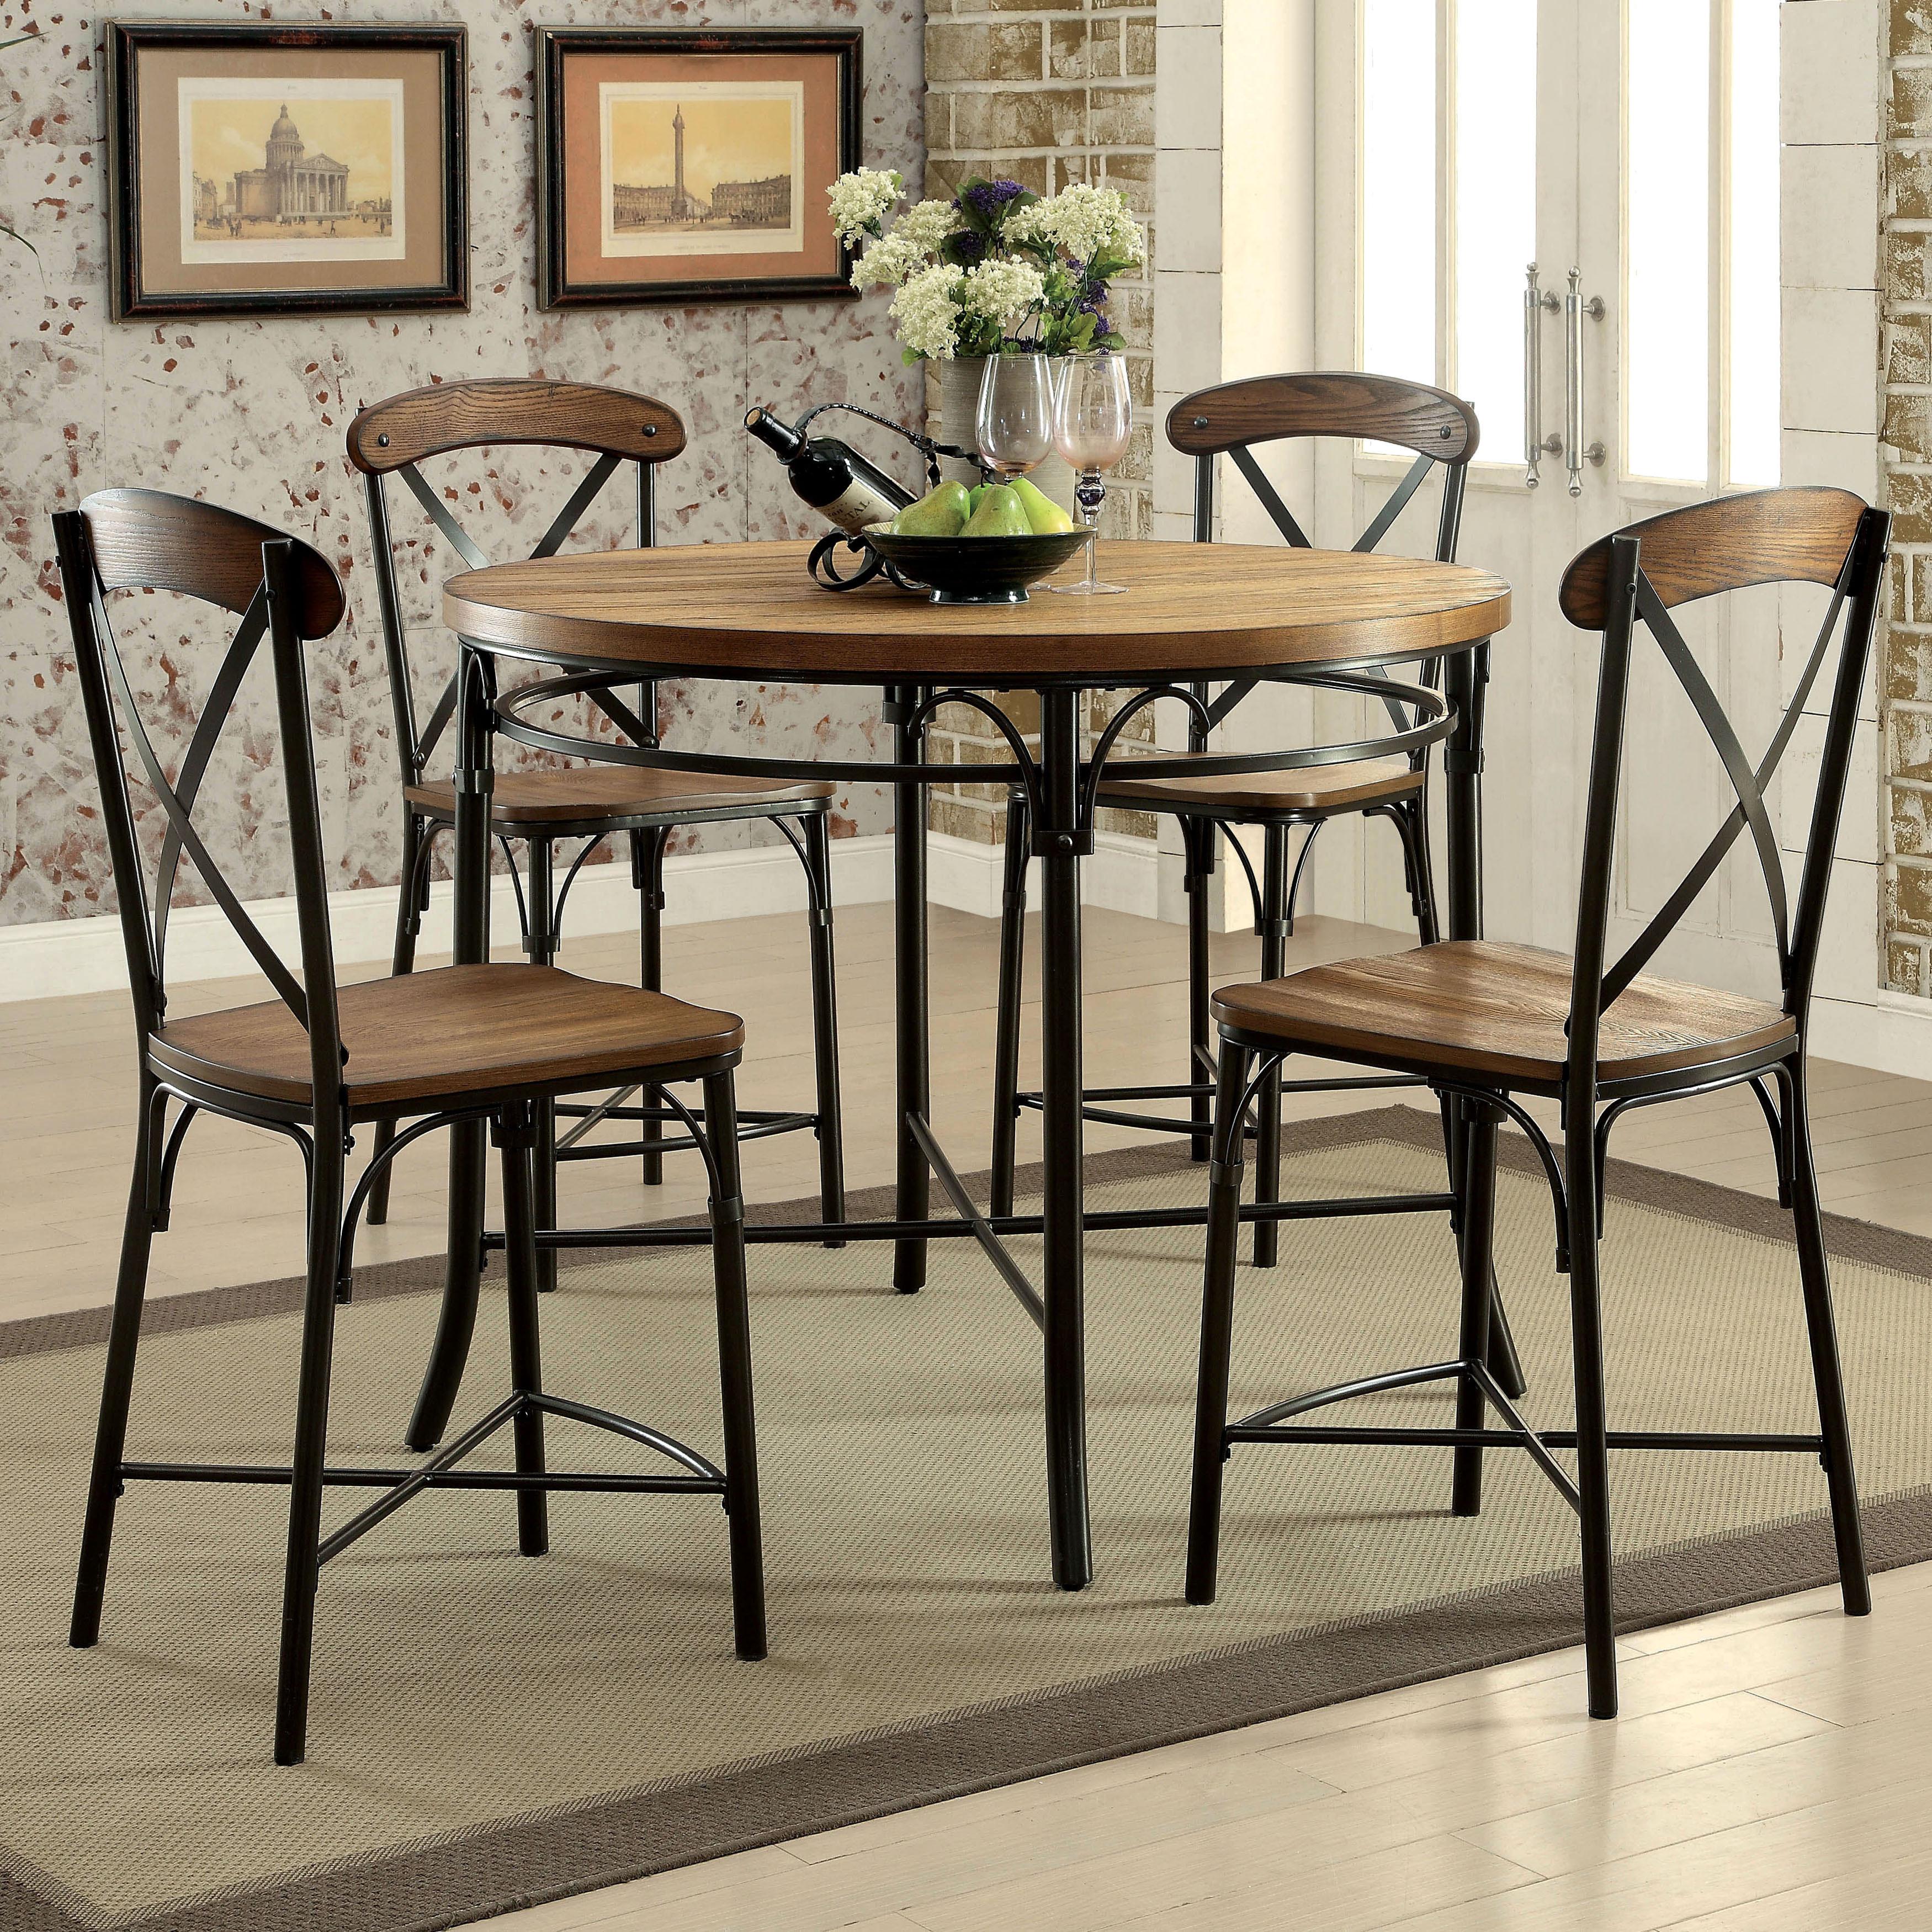 Furniture of America Merrits Industrial 5-piece Bronze Ro...